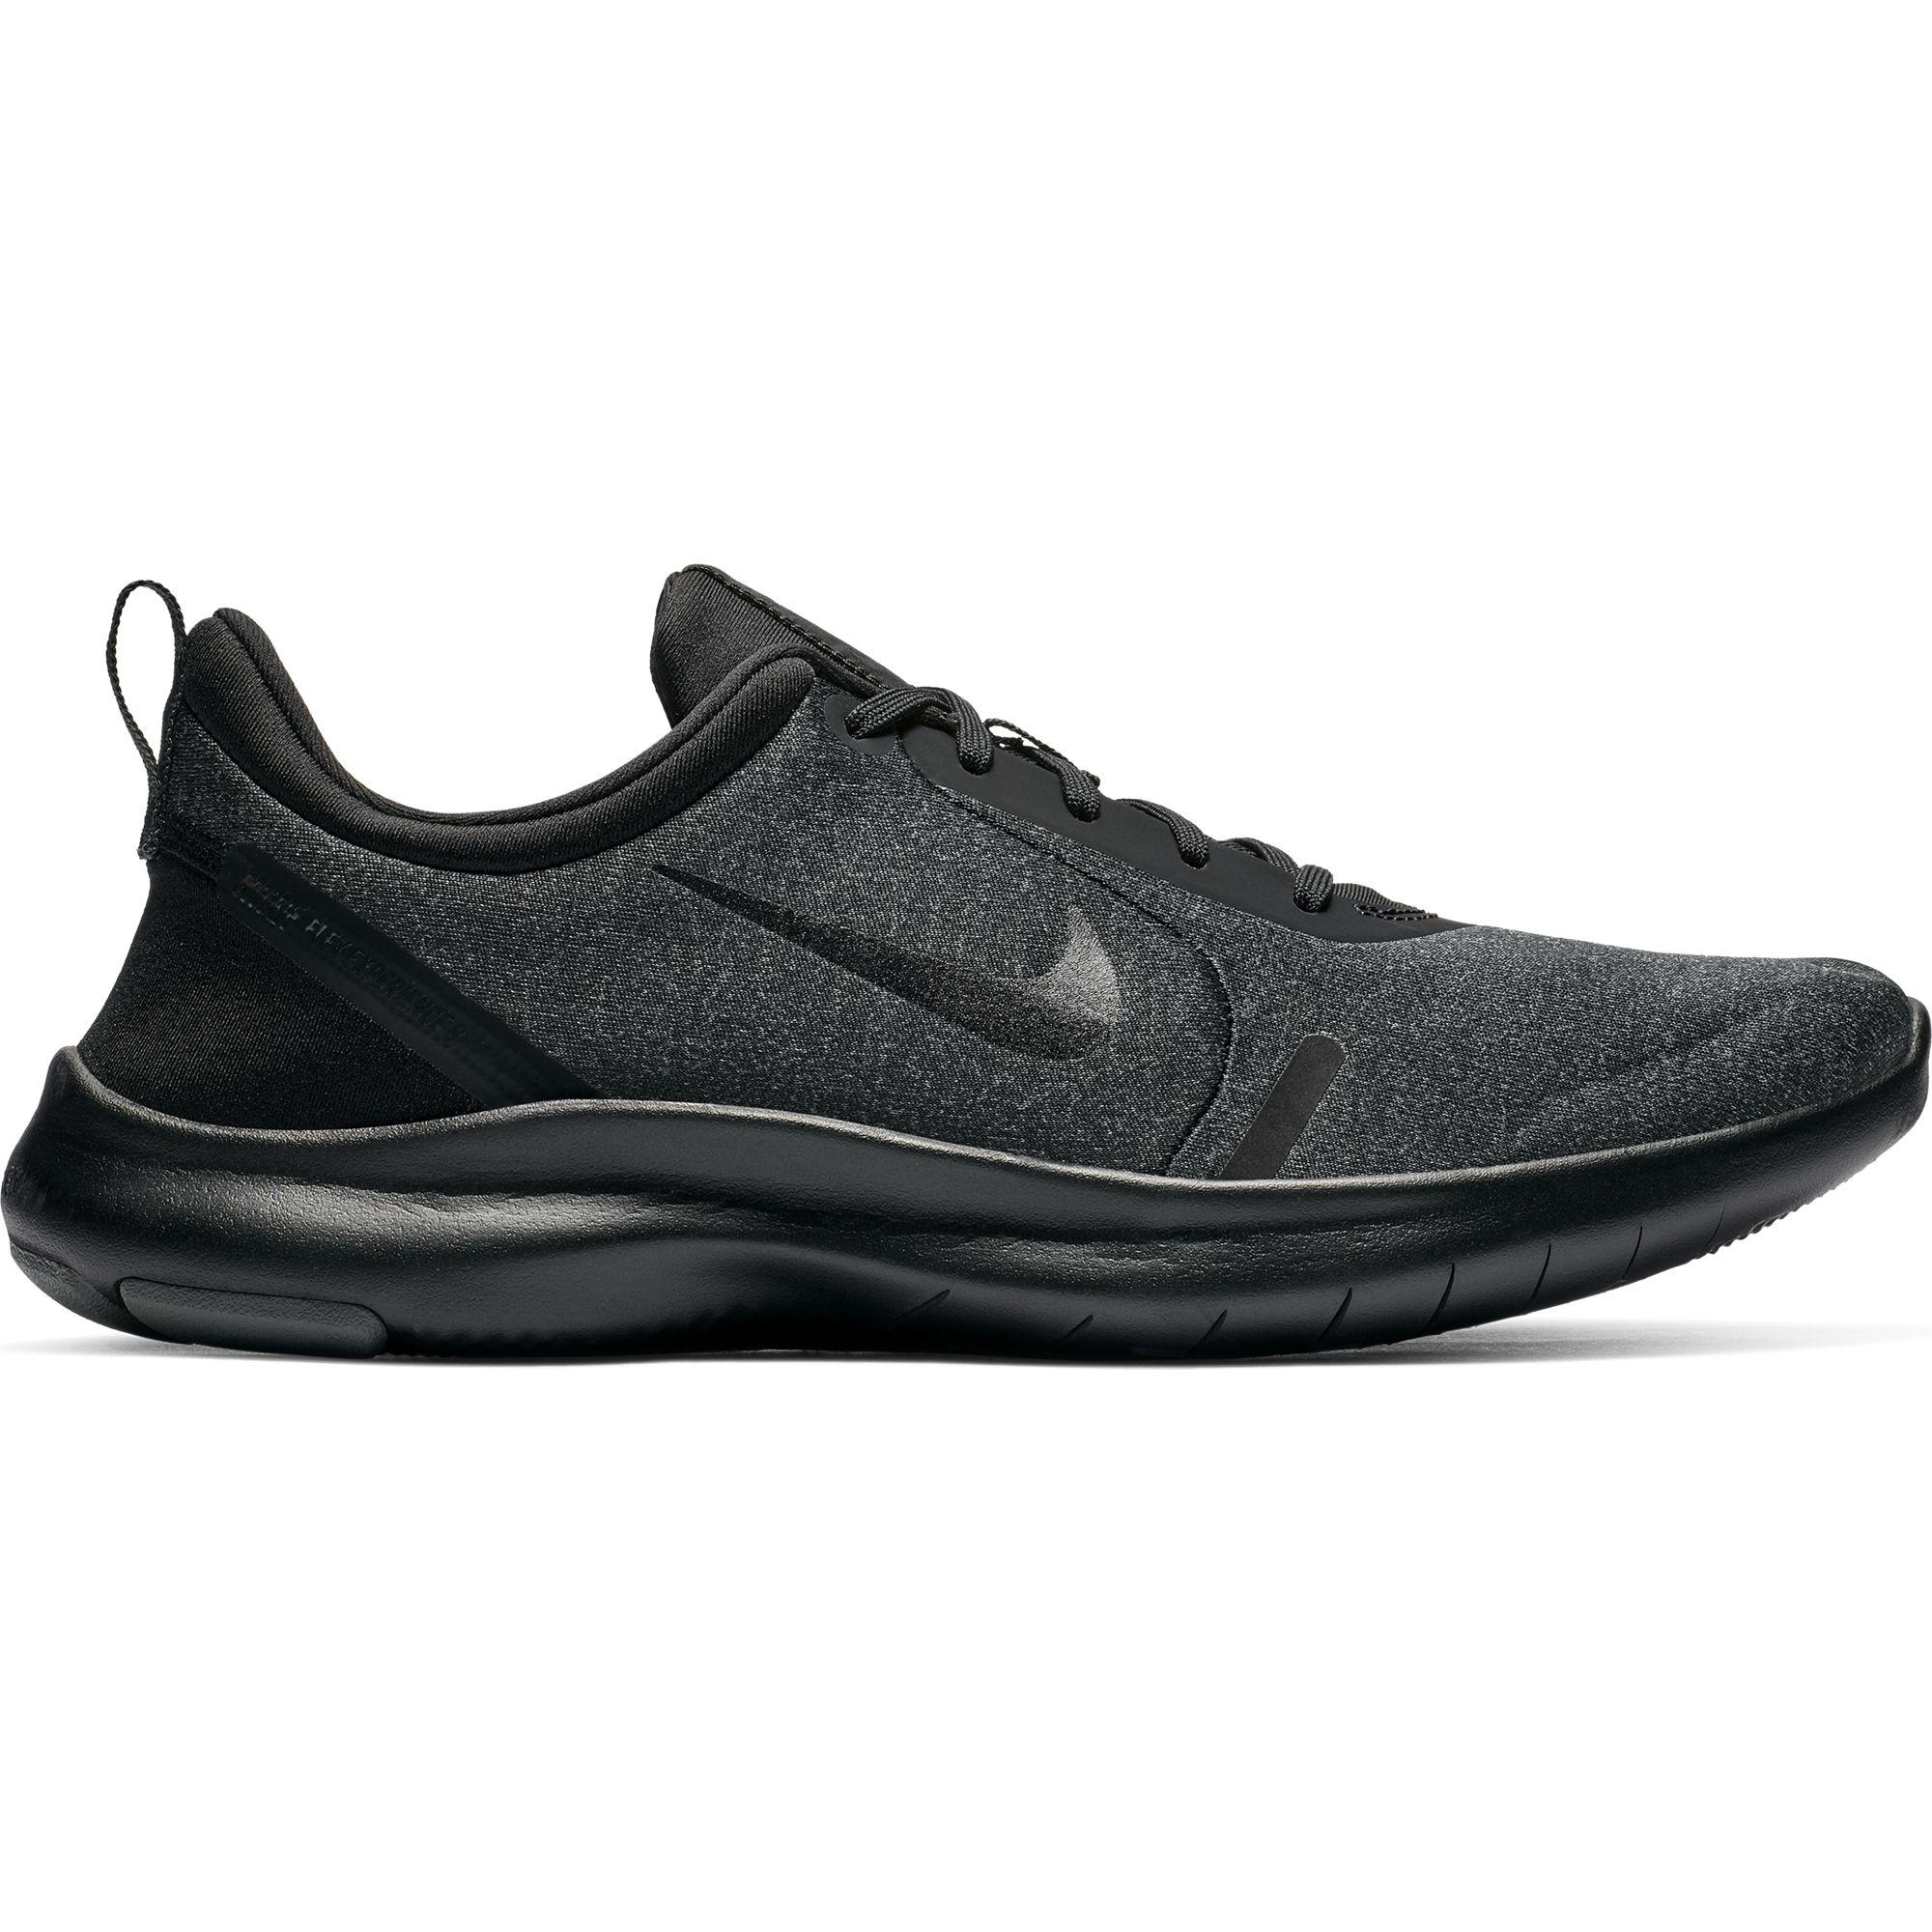 7d545187b703 Description  Nike Flex Experience RN 8 Men s Running Shoe ...